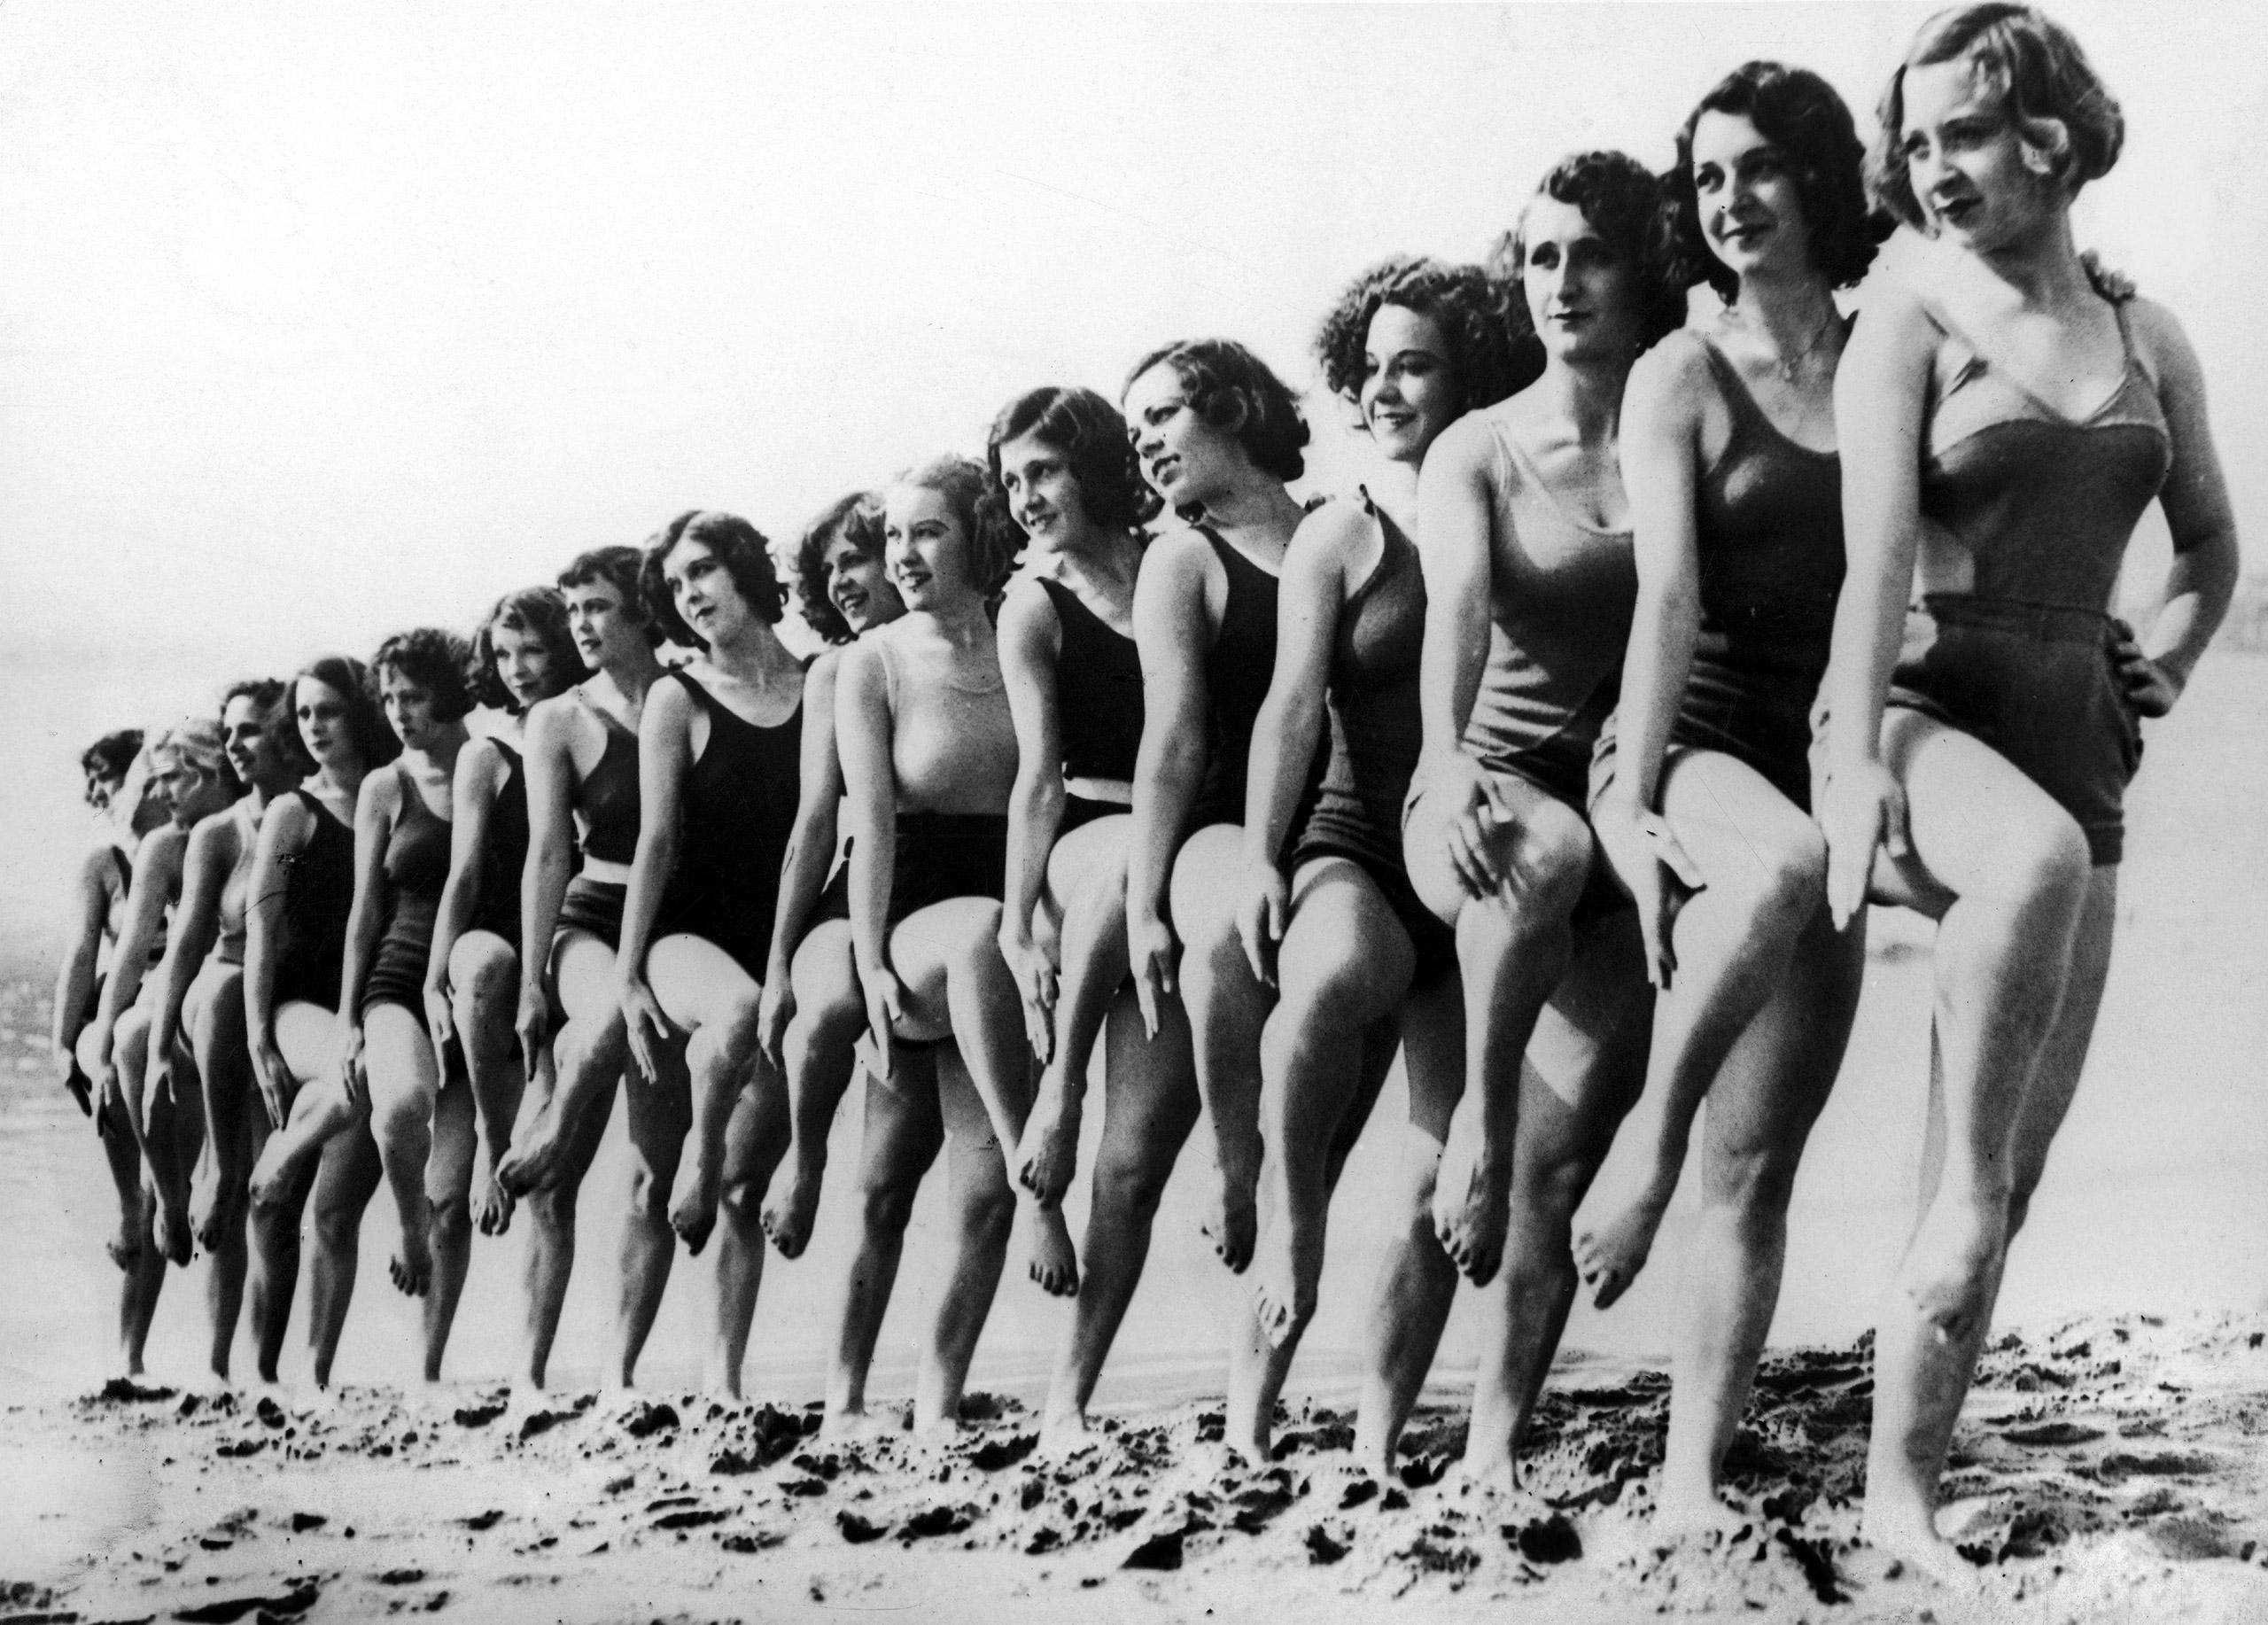 The Latest In swimwear on a beach In California, circa 1934.